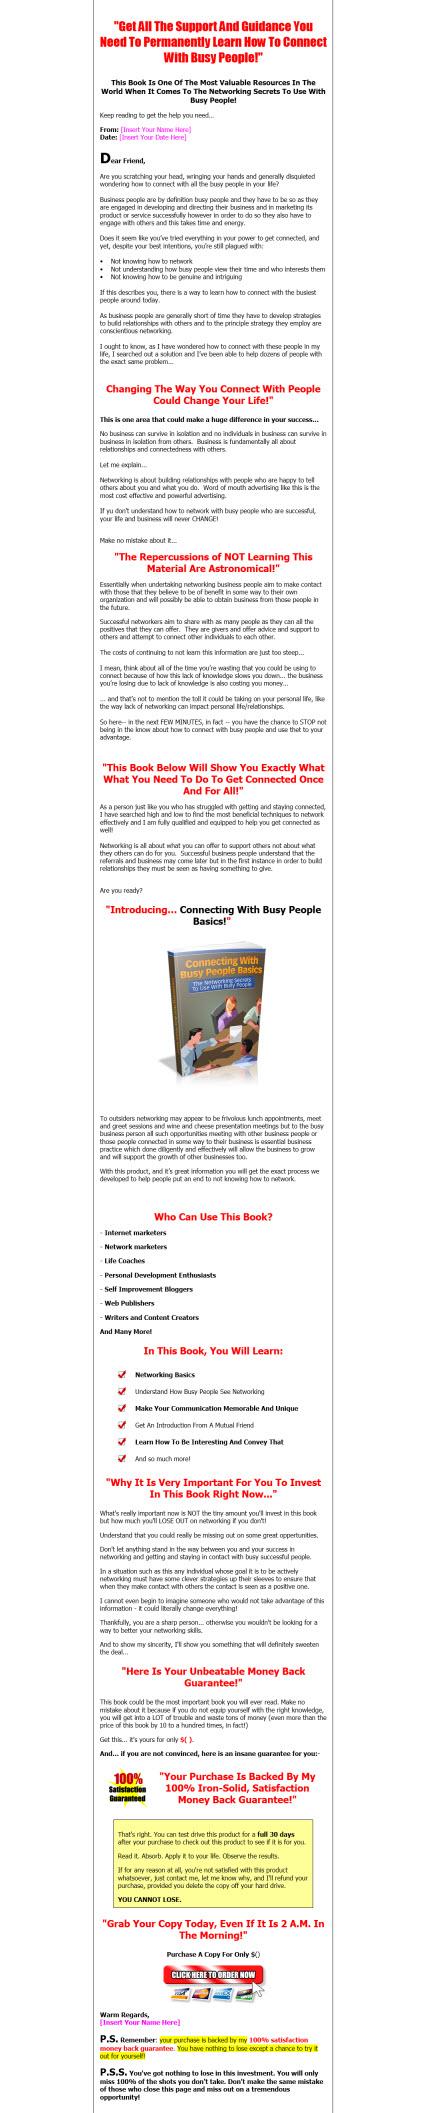 Networking Basics Ebook